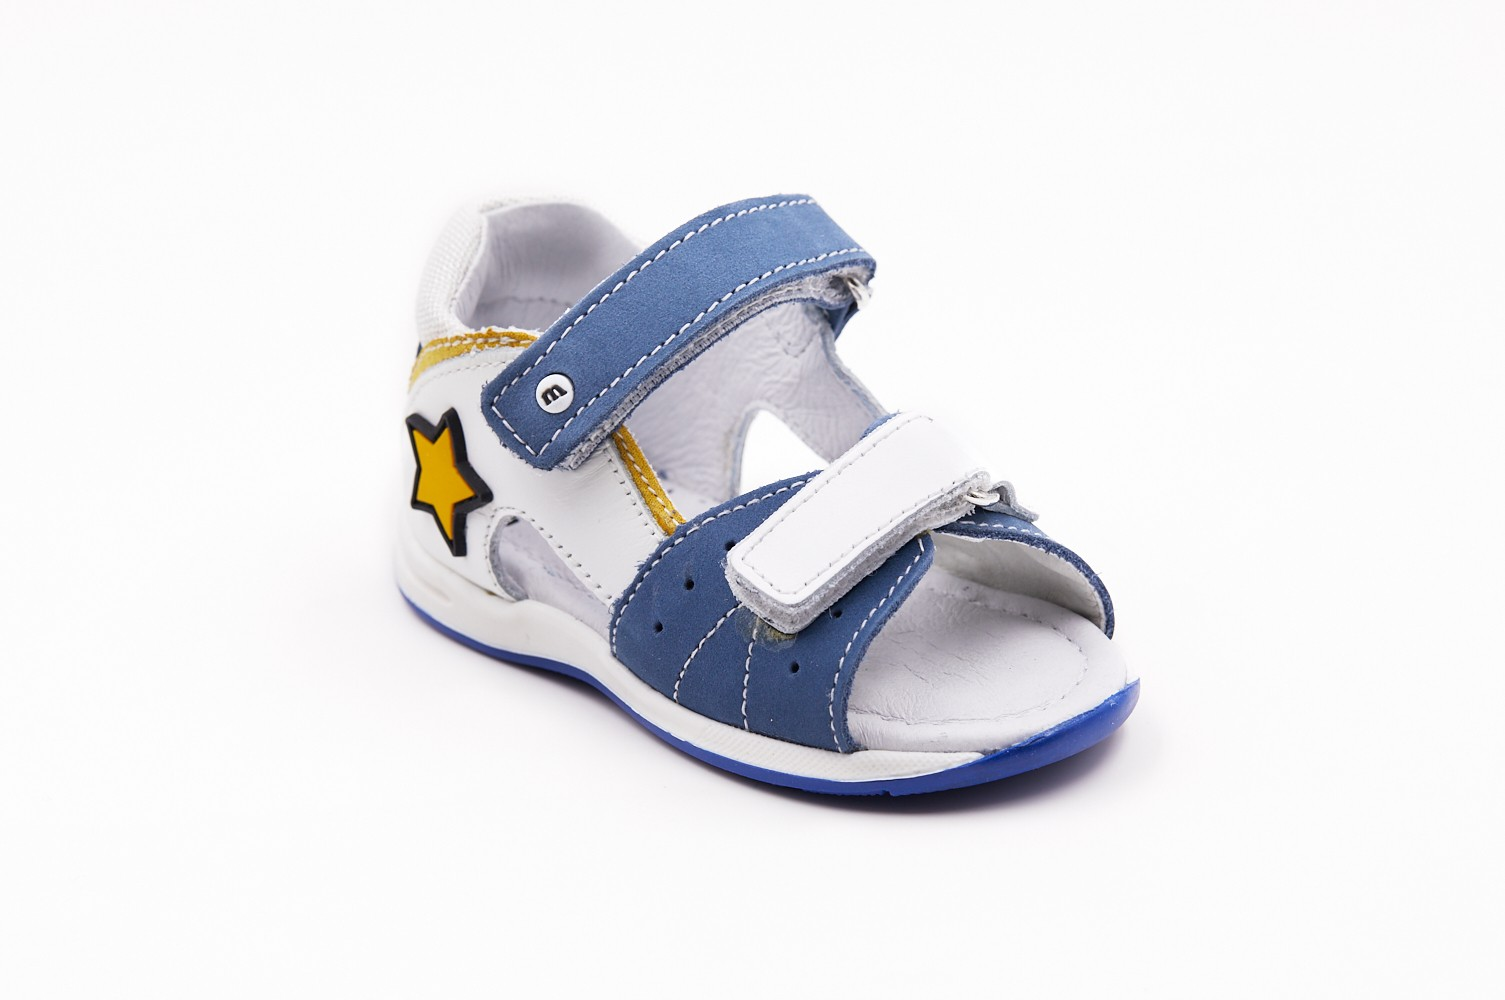 Sandale albastru/alb dublu scay